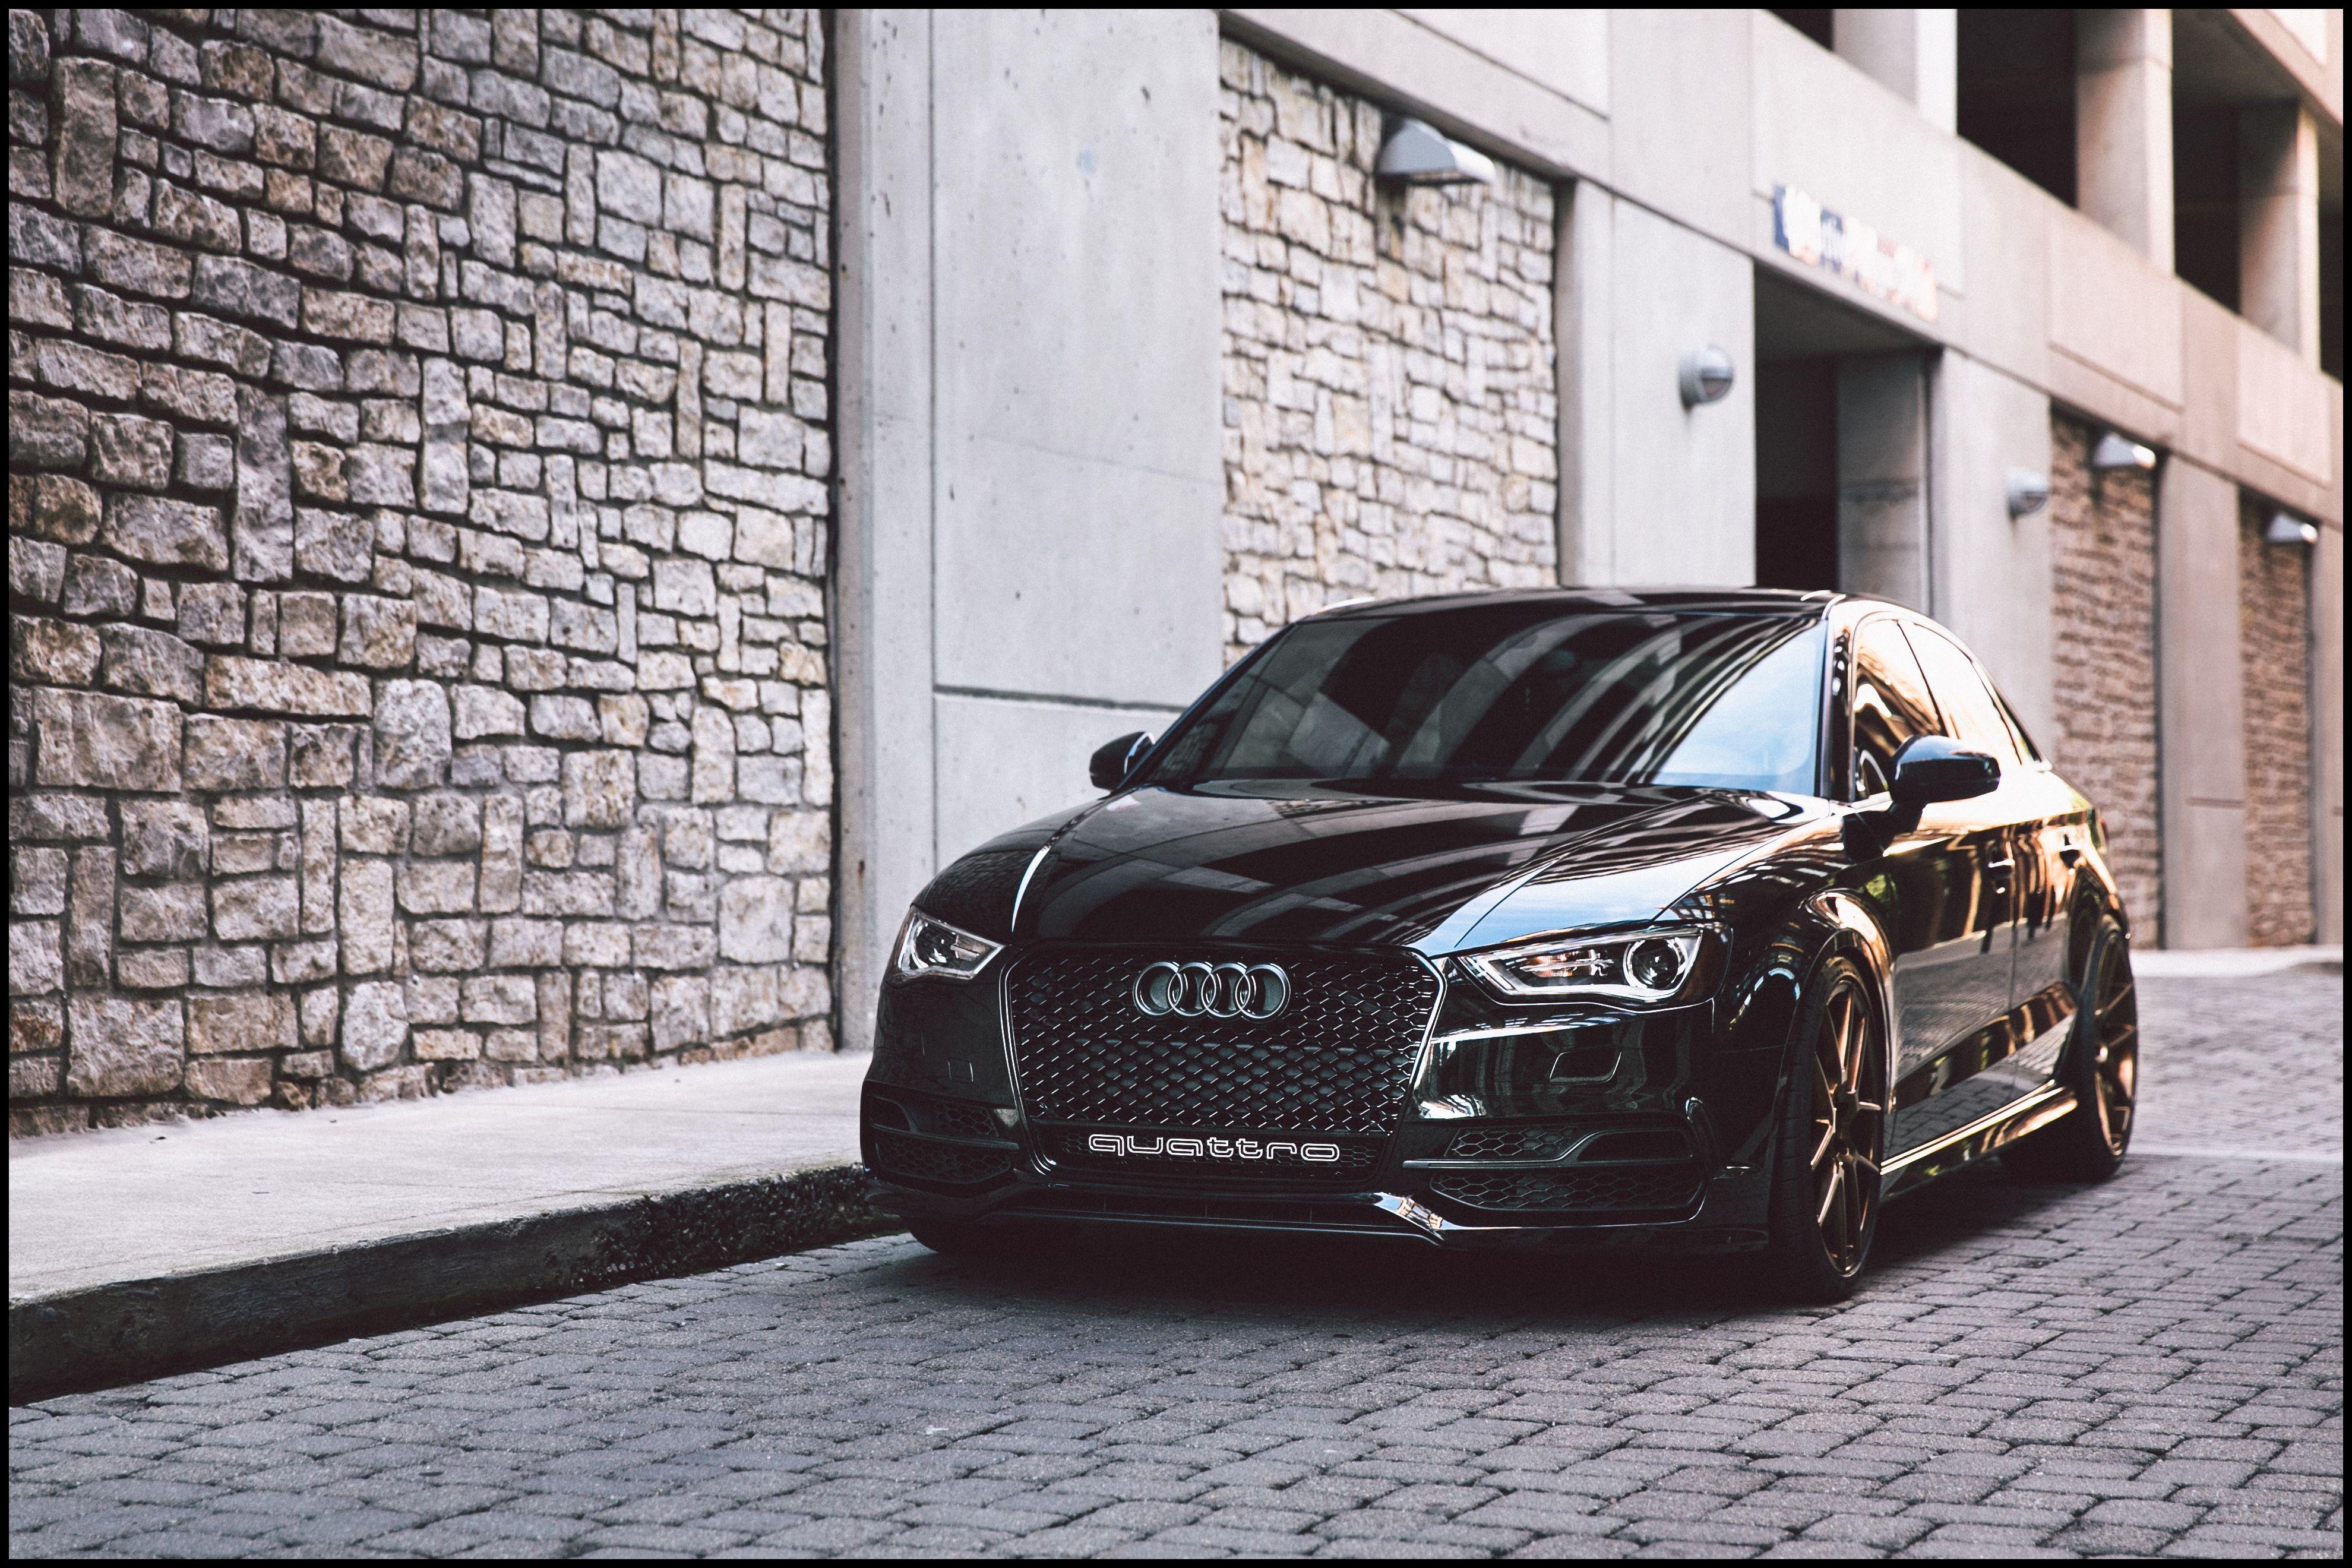 Audi Wilsonville Service Fresh 2015 Audi S3 Sedan Avant Garde M510 Antique Matte Bronze